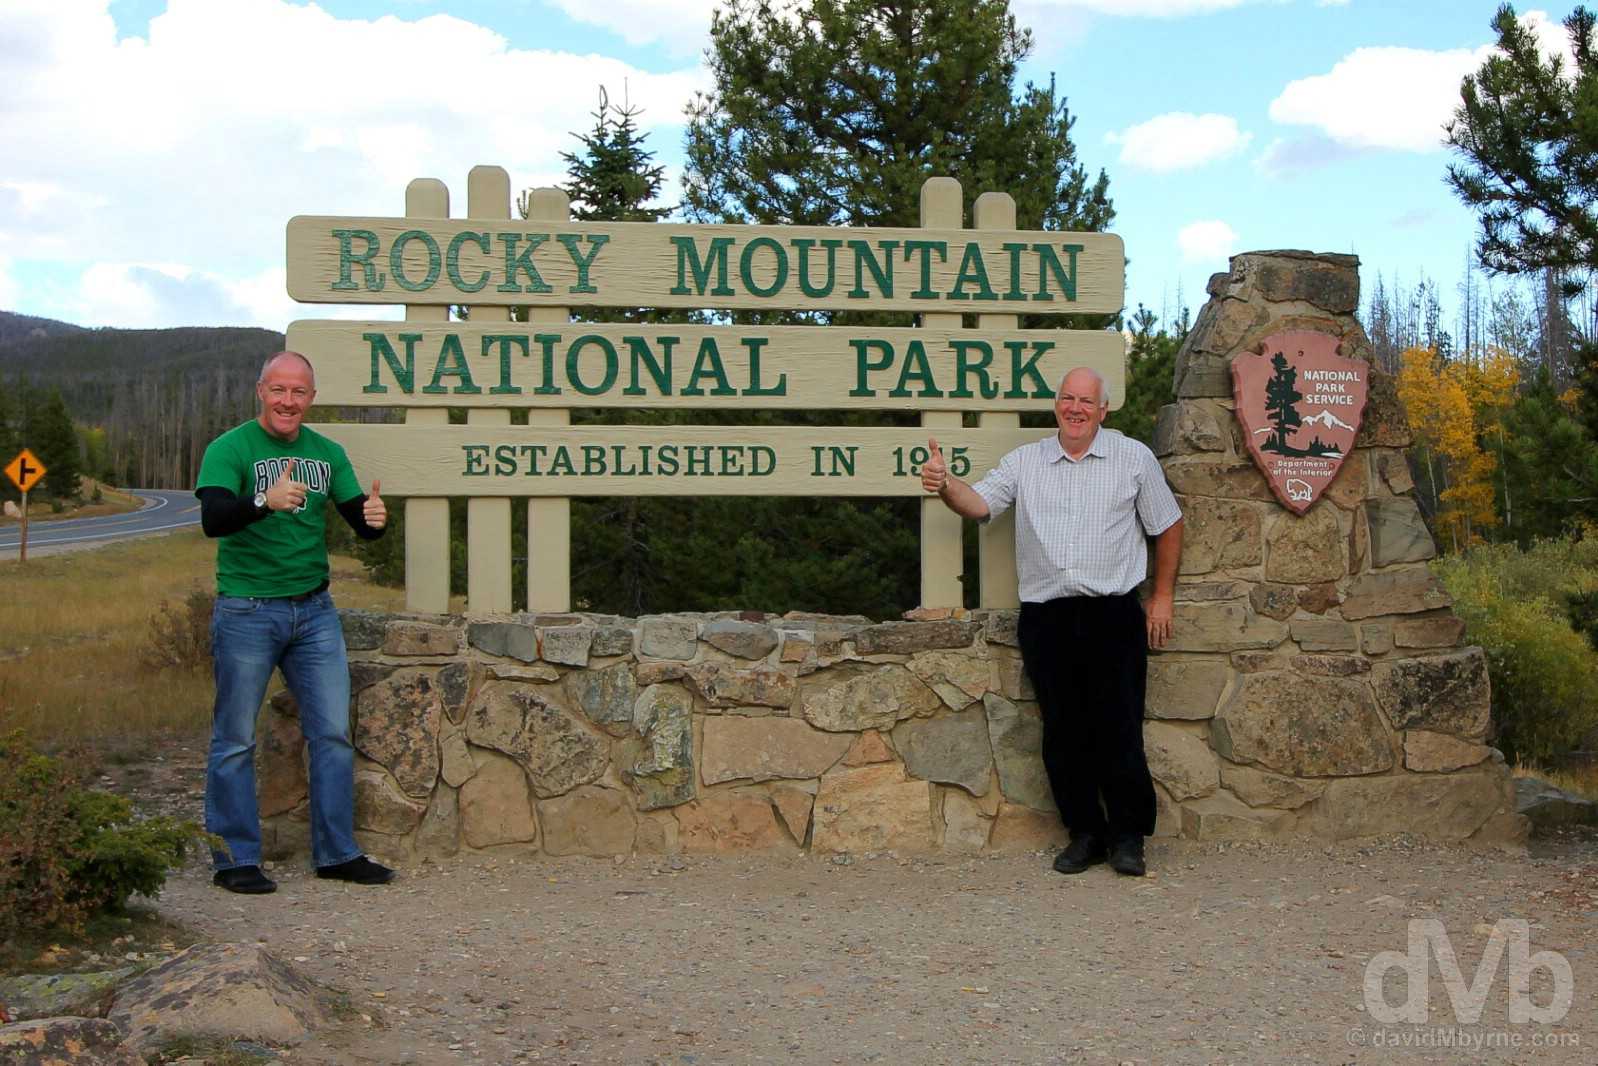 Rocky Mountain National Park, north-central Colorado, USA. September 13, 2016.